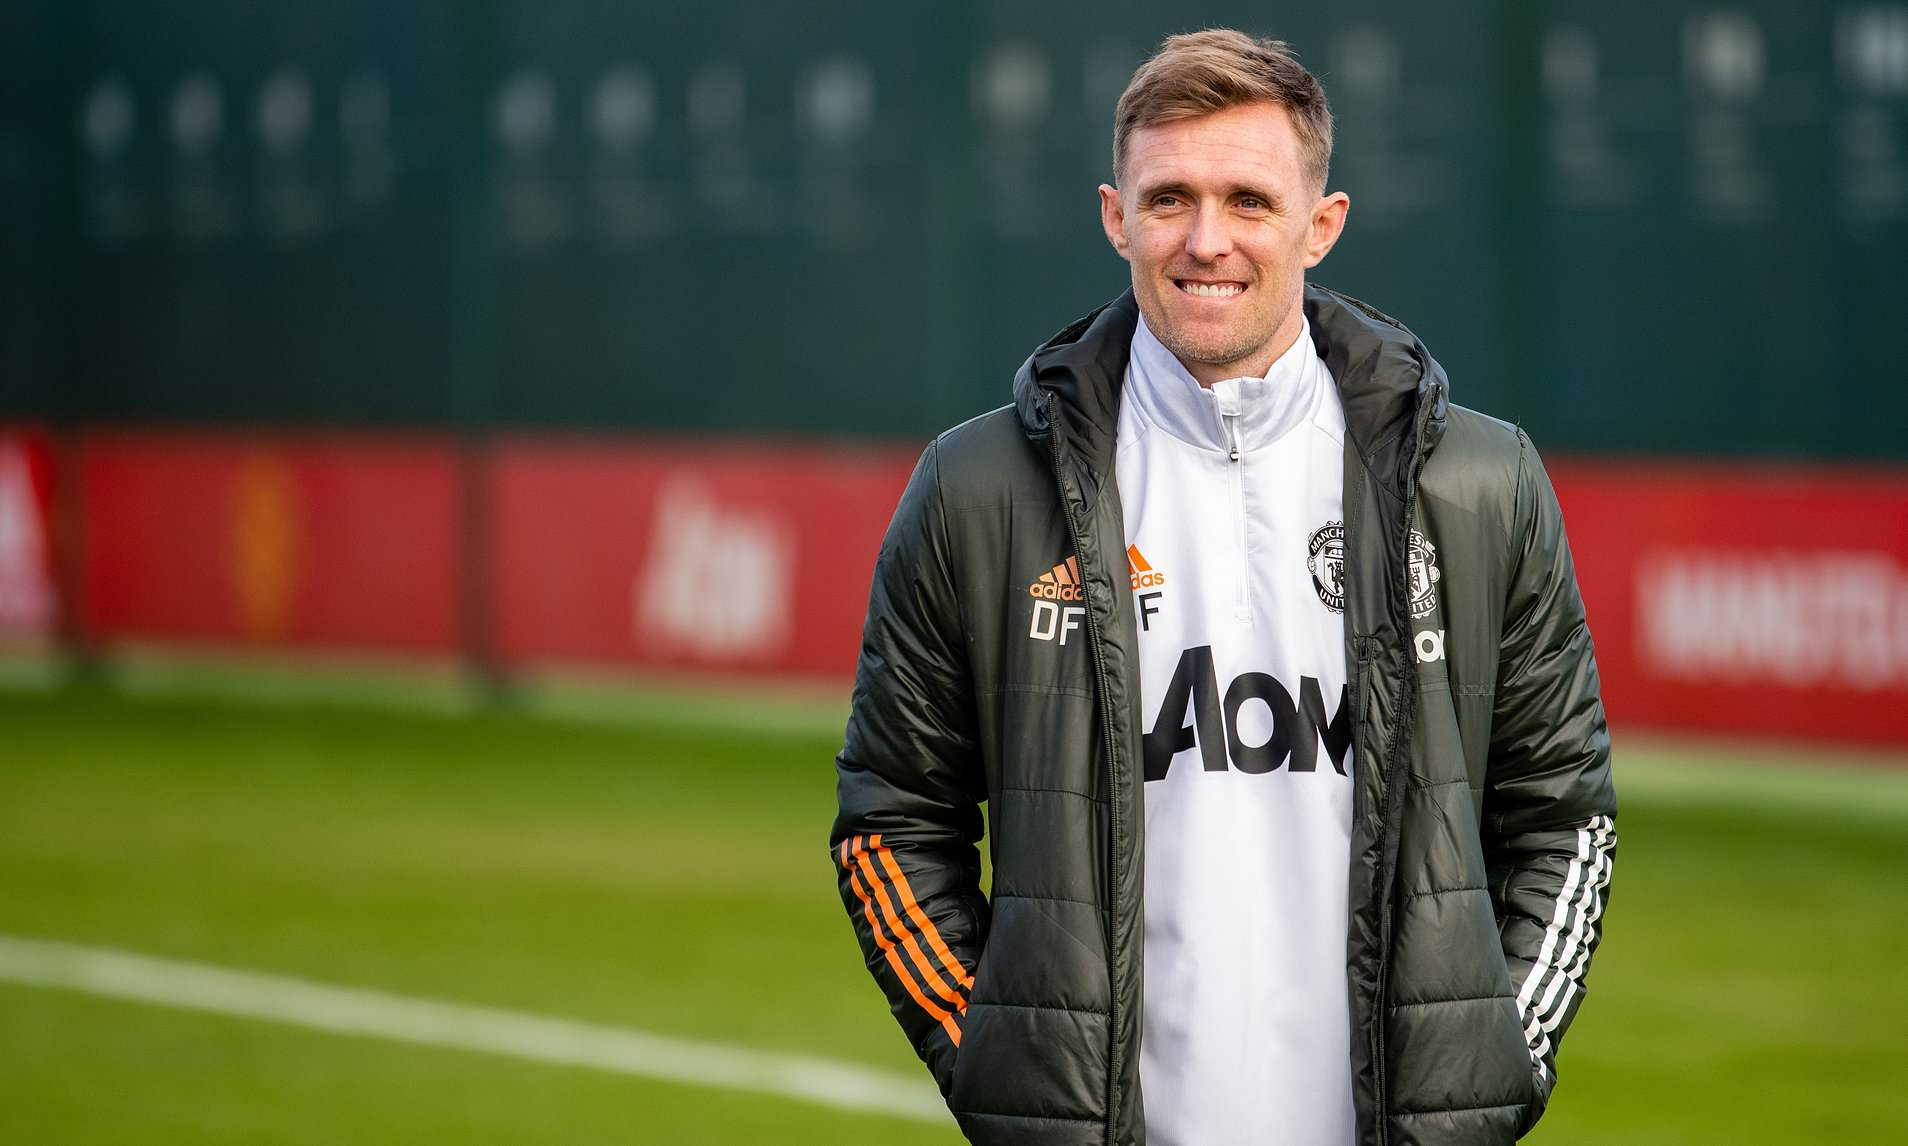 Man United Promote Fletcher To Solskjaer's First-Team Coaching Staff